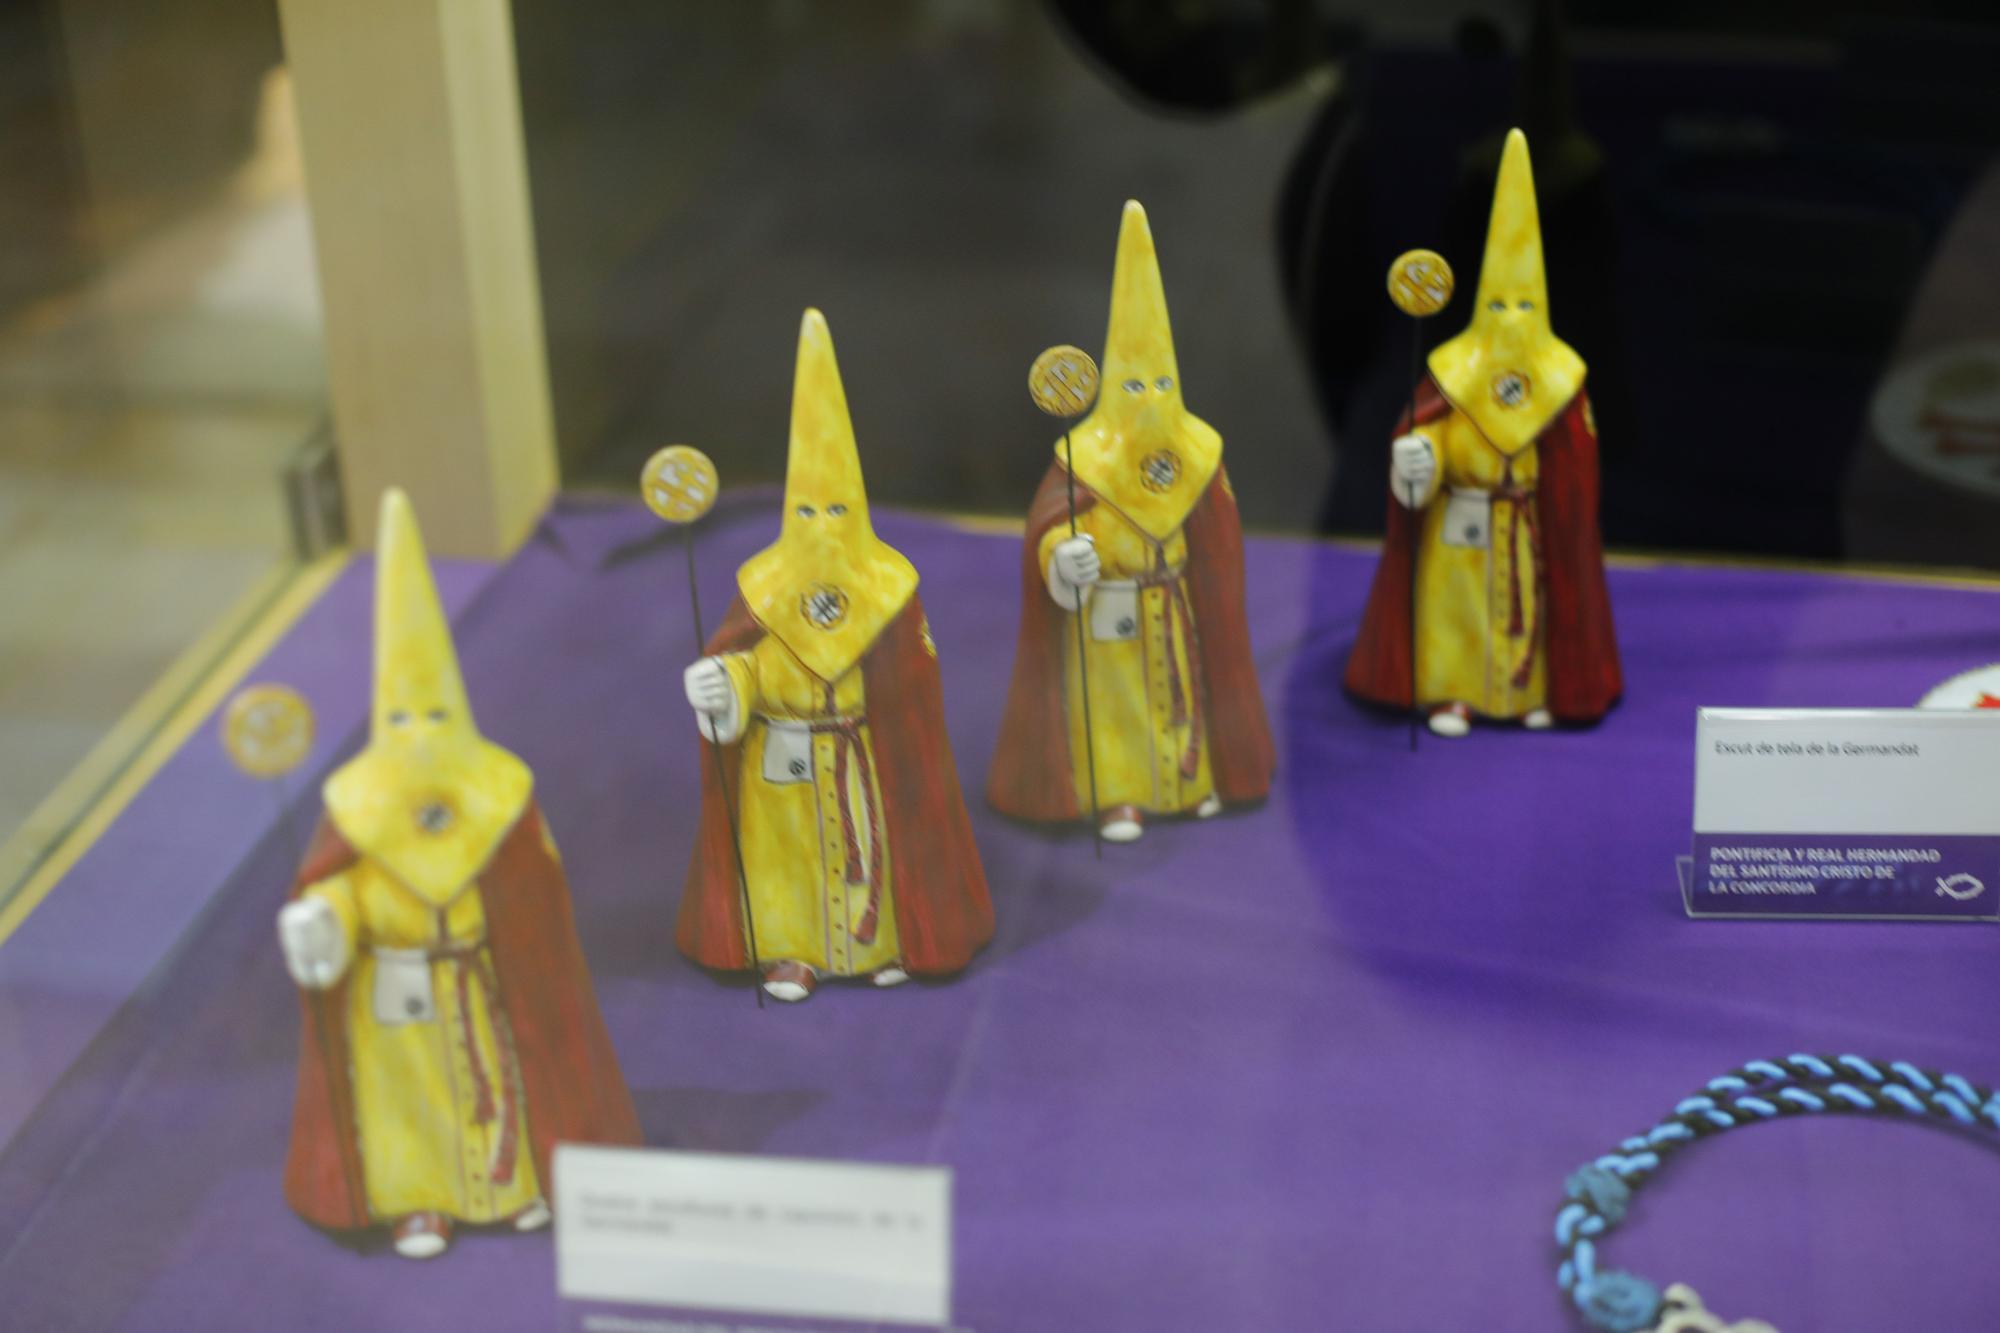 Semana Santa Marinera: Una visita al museo